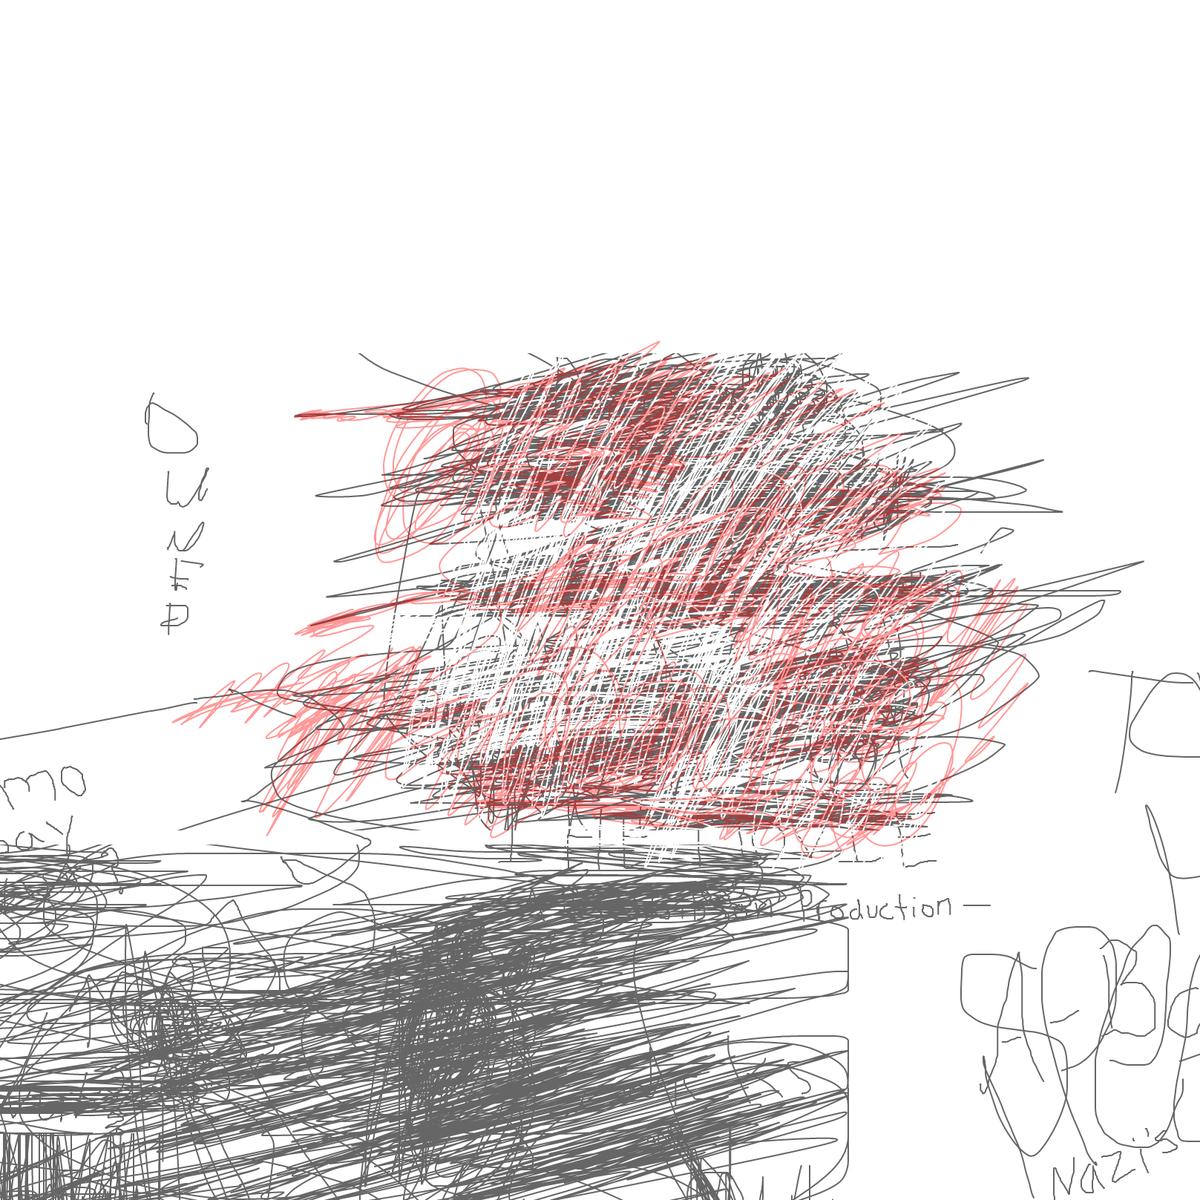 BAAAM drawing#5938 lat:40.7132148742675800lng: -74.0122299194336000